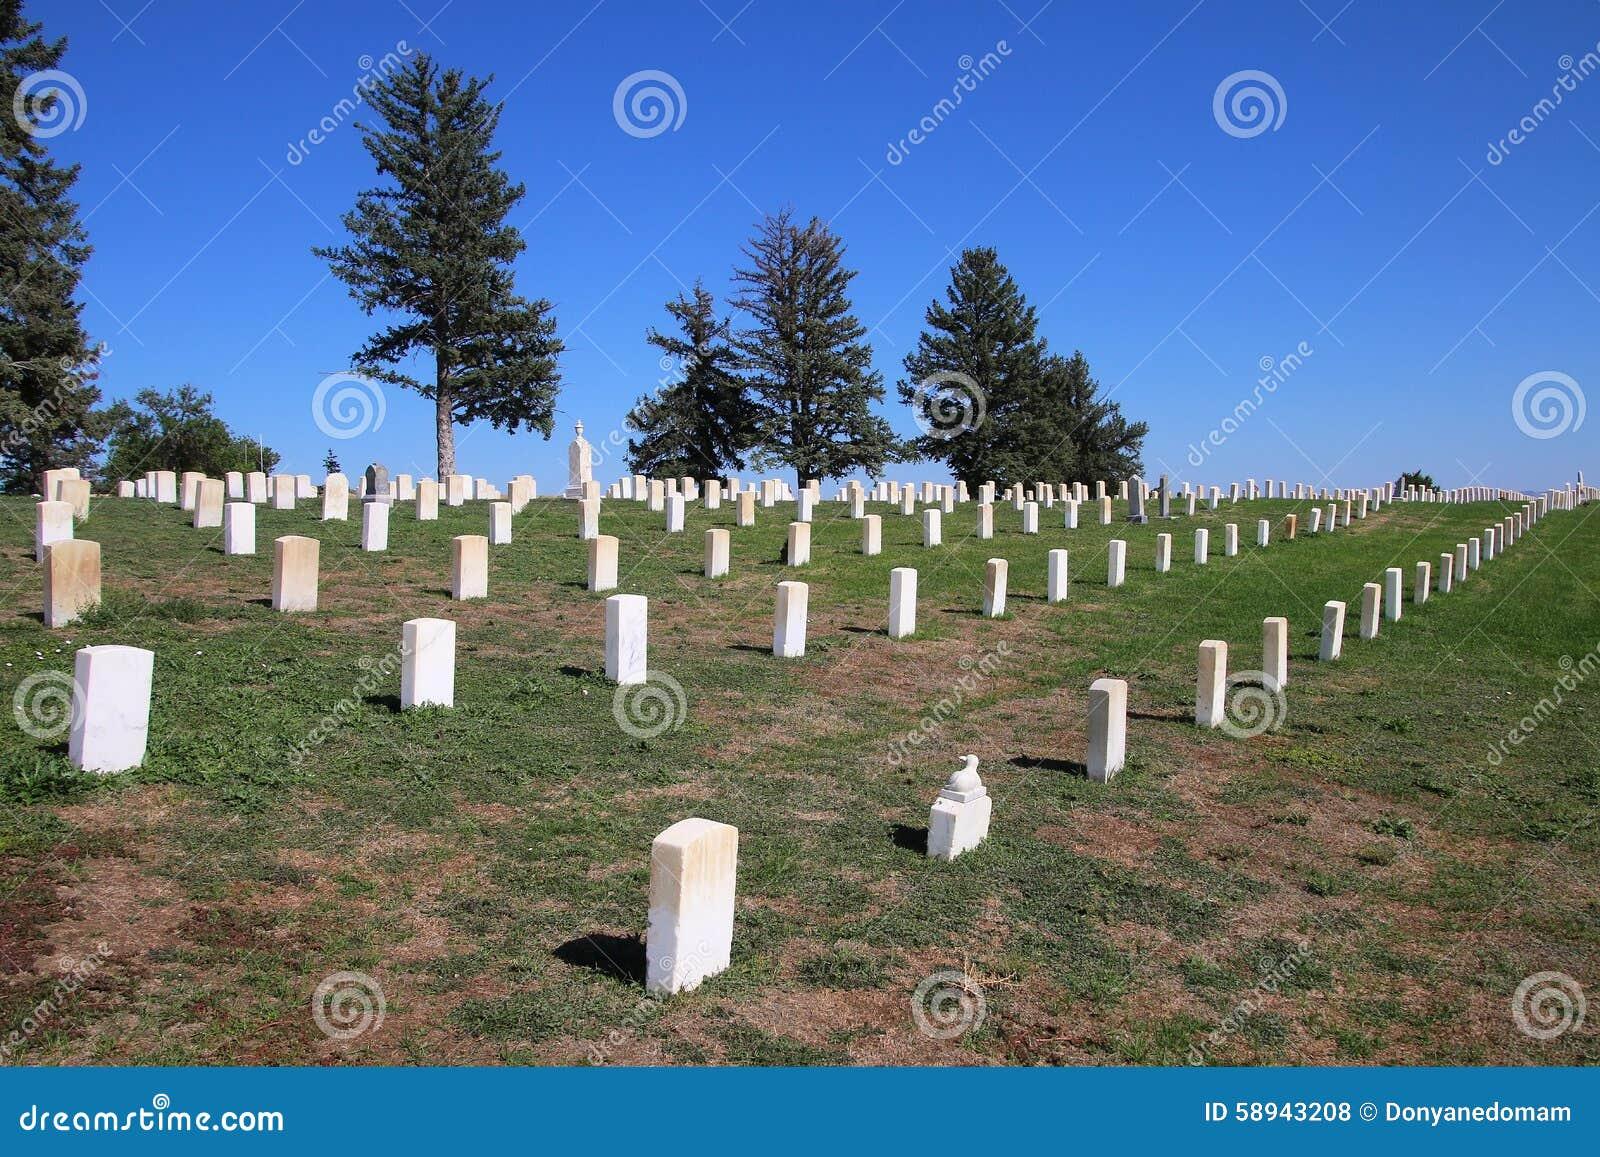 Custer National Cemetery at Little Bighorn Battlefield National